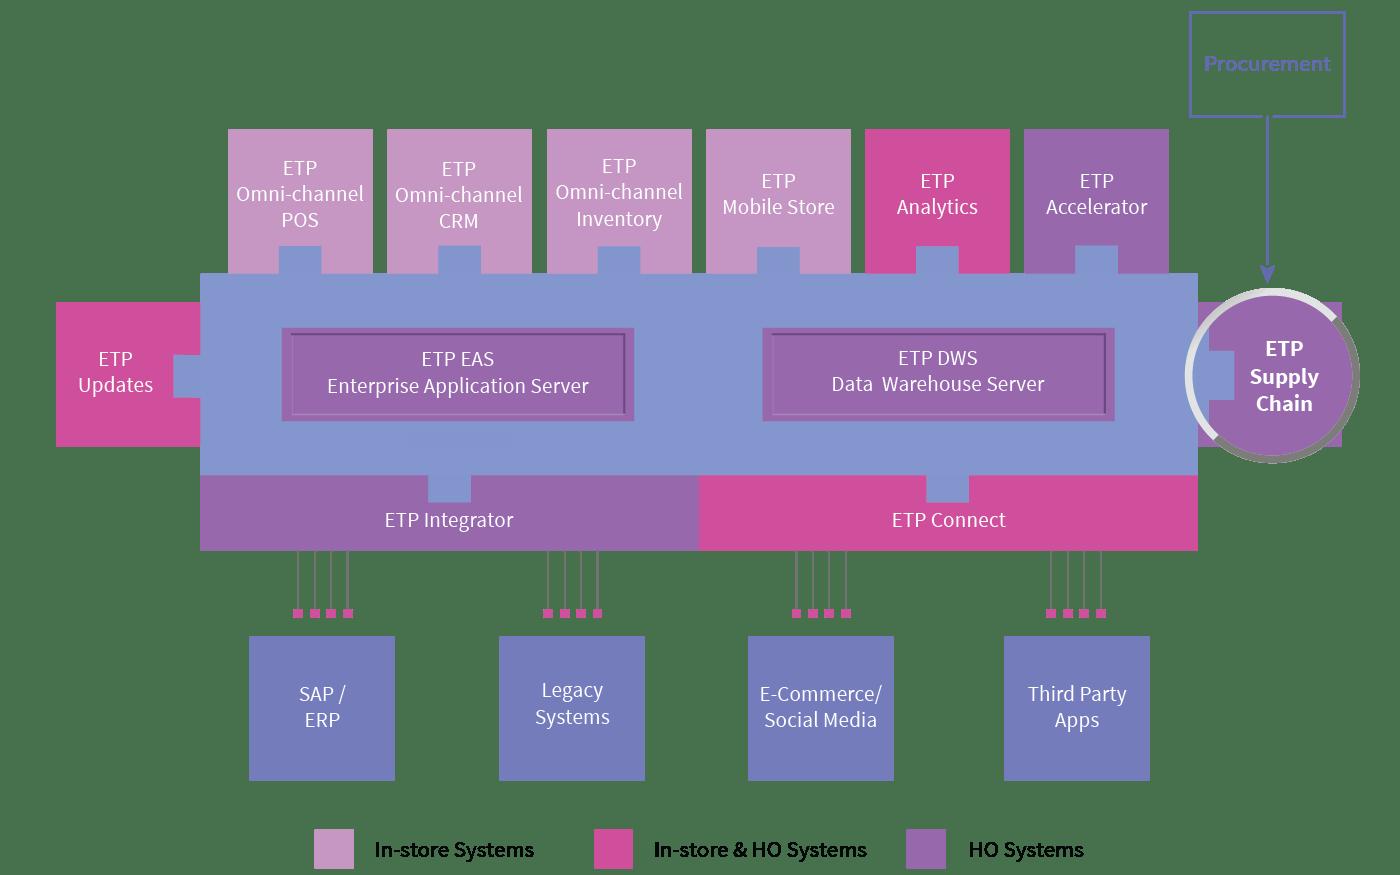 etp-supply-chain-procurement